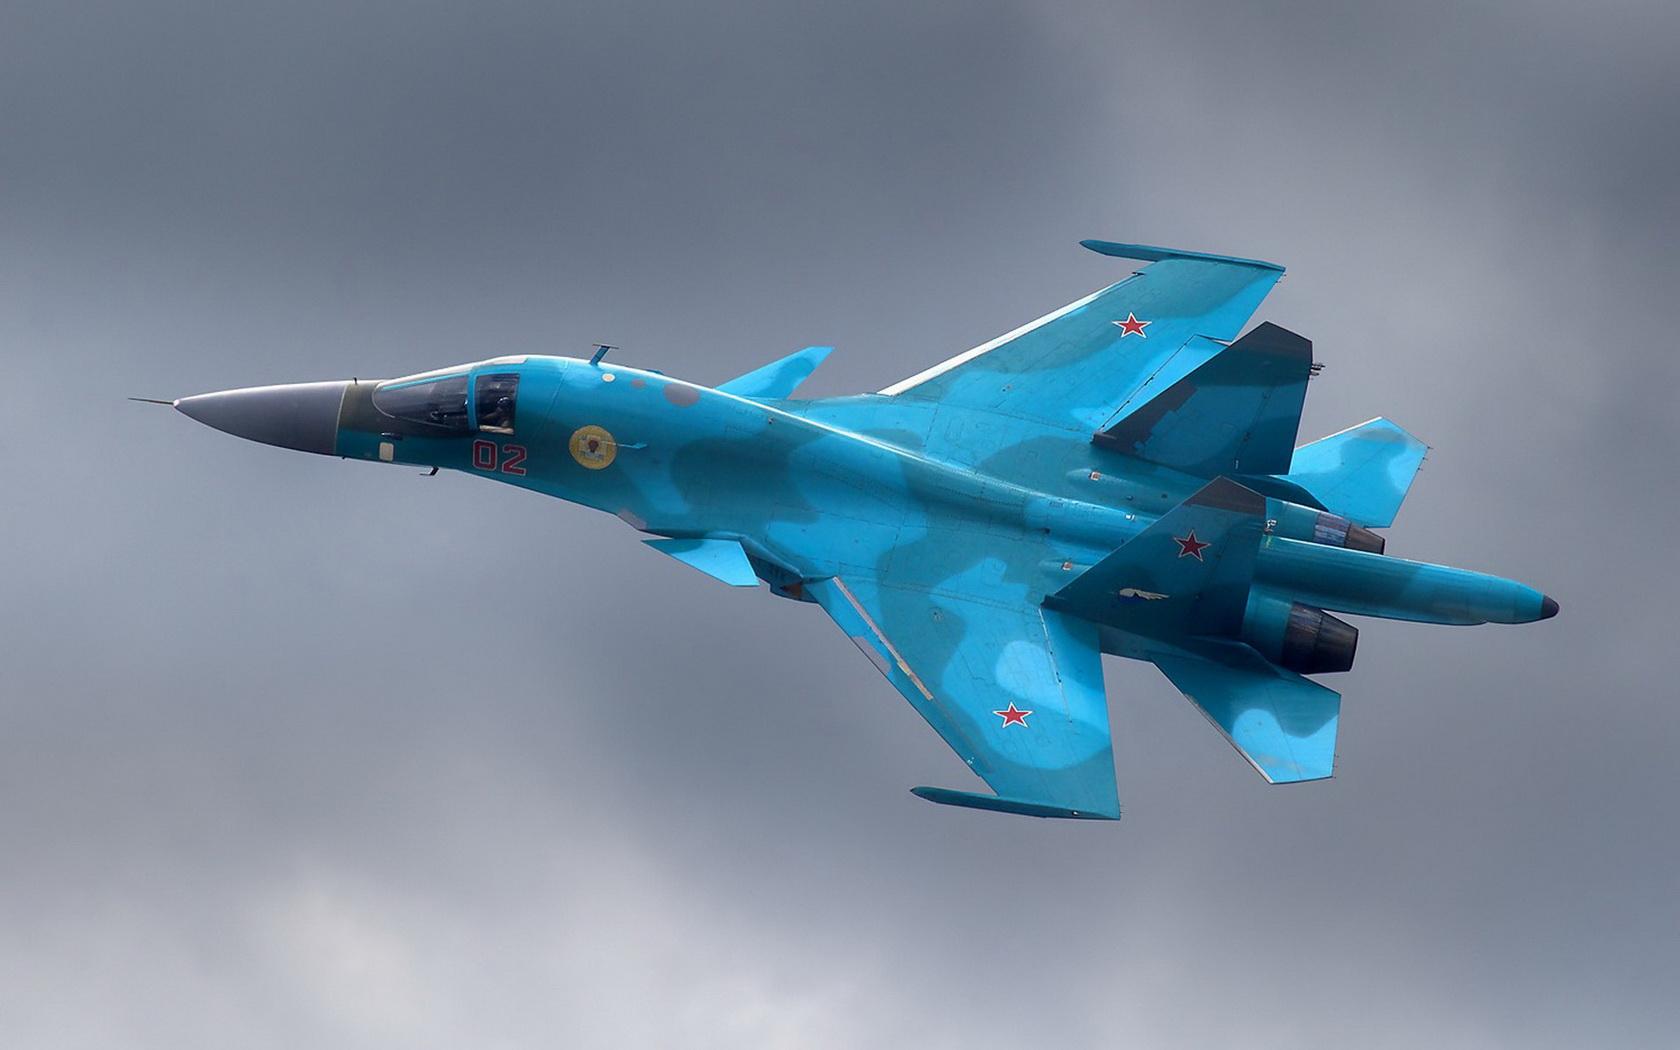 Avión militar - 1680x1050